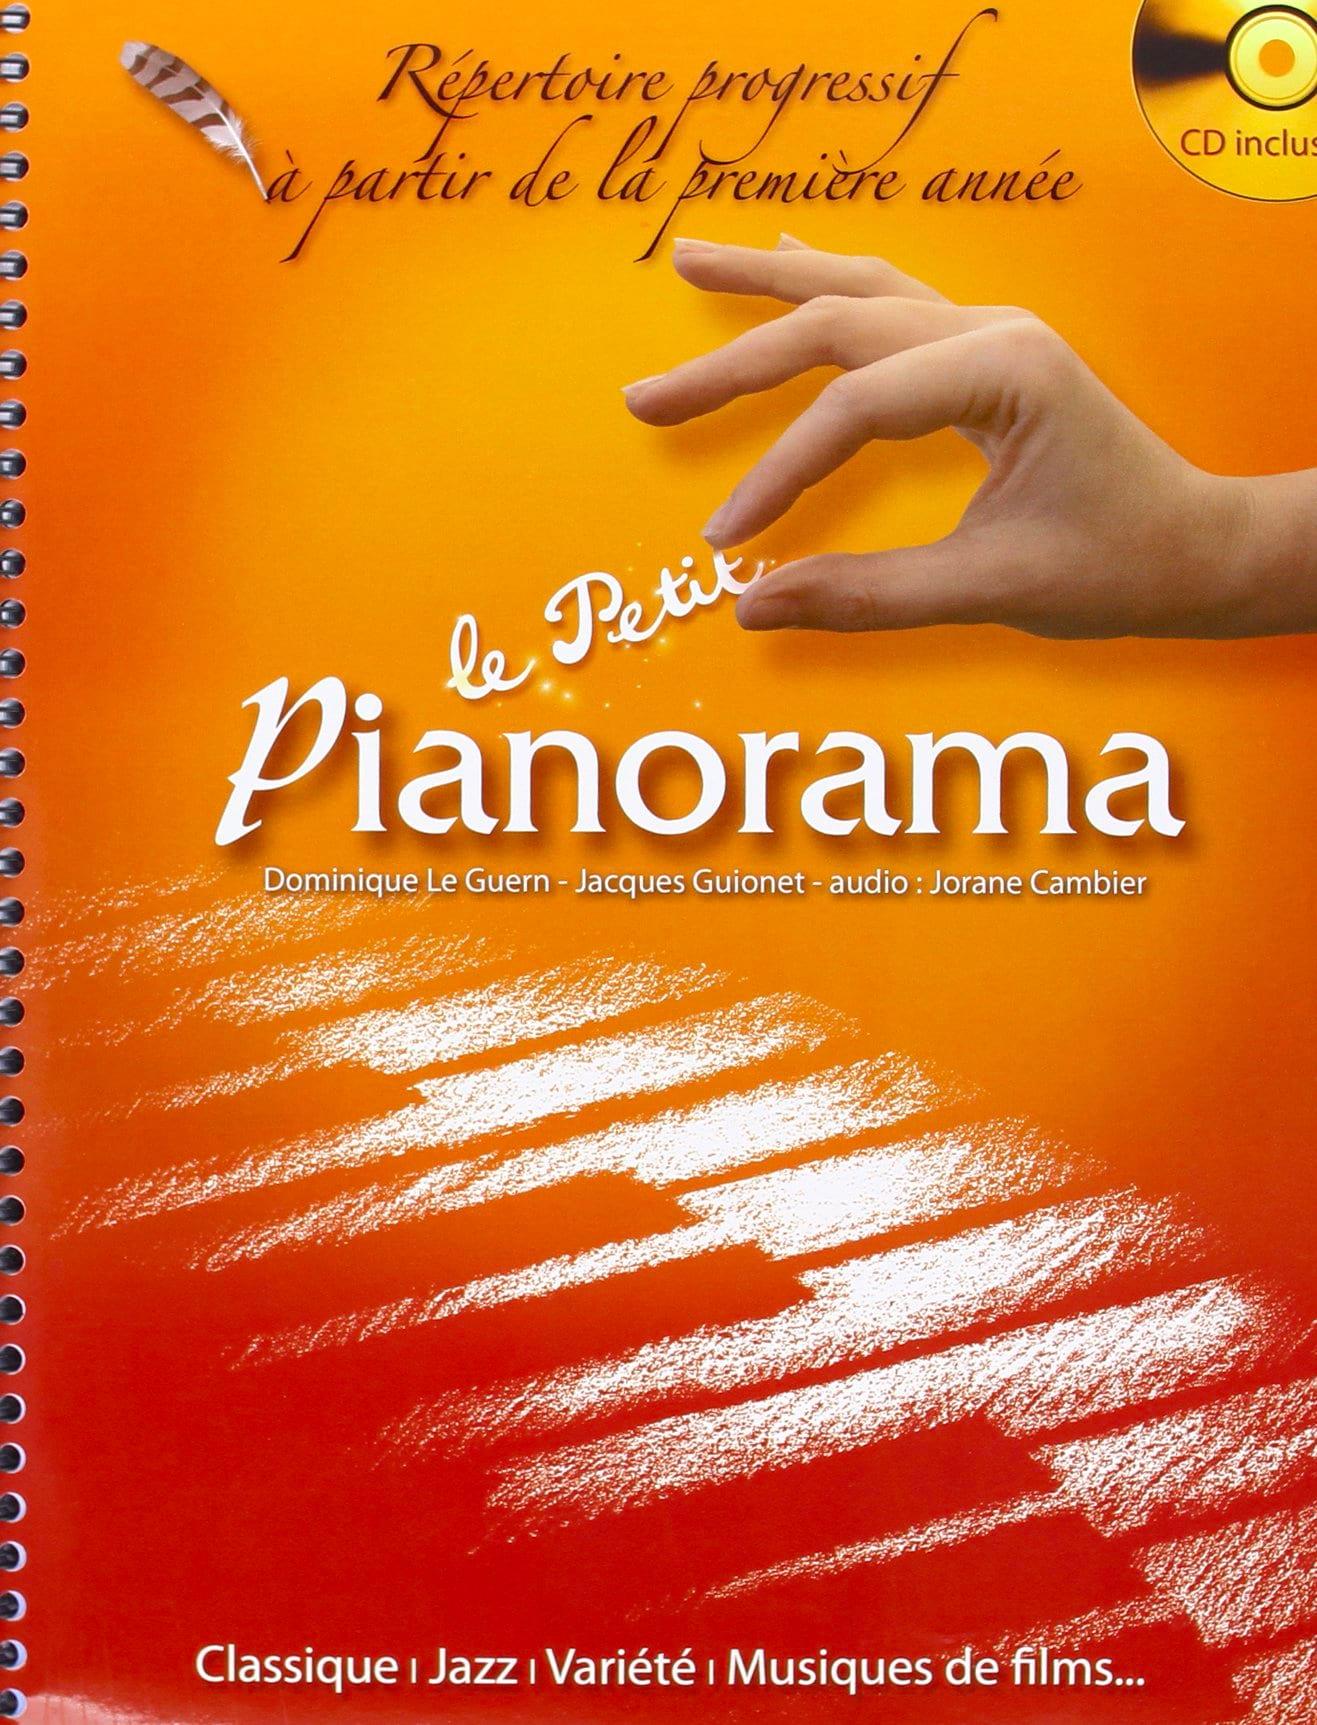 Le Petit Pianorama - Partition - Piano - laflutedepan.be